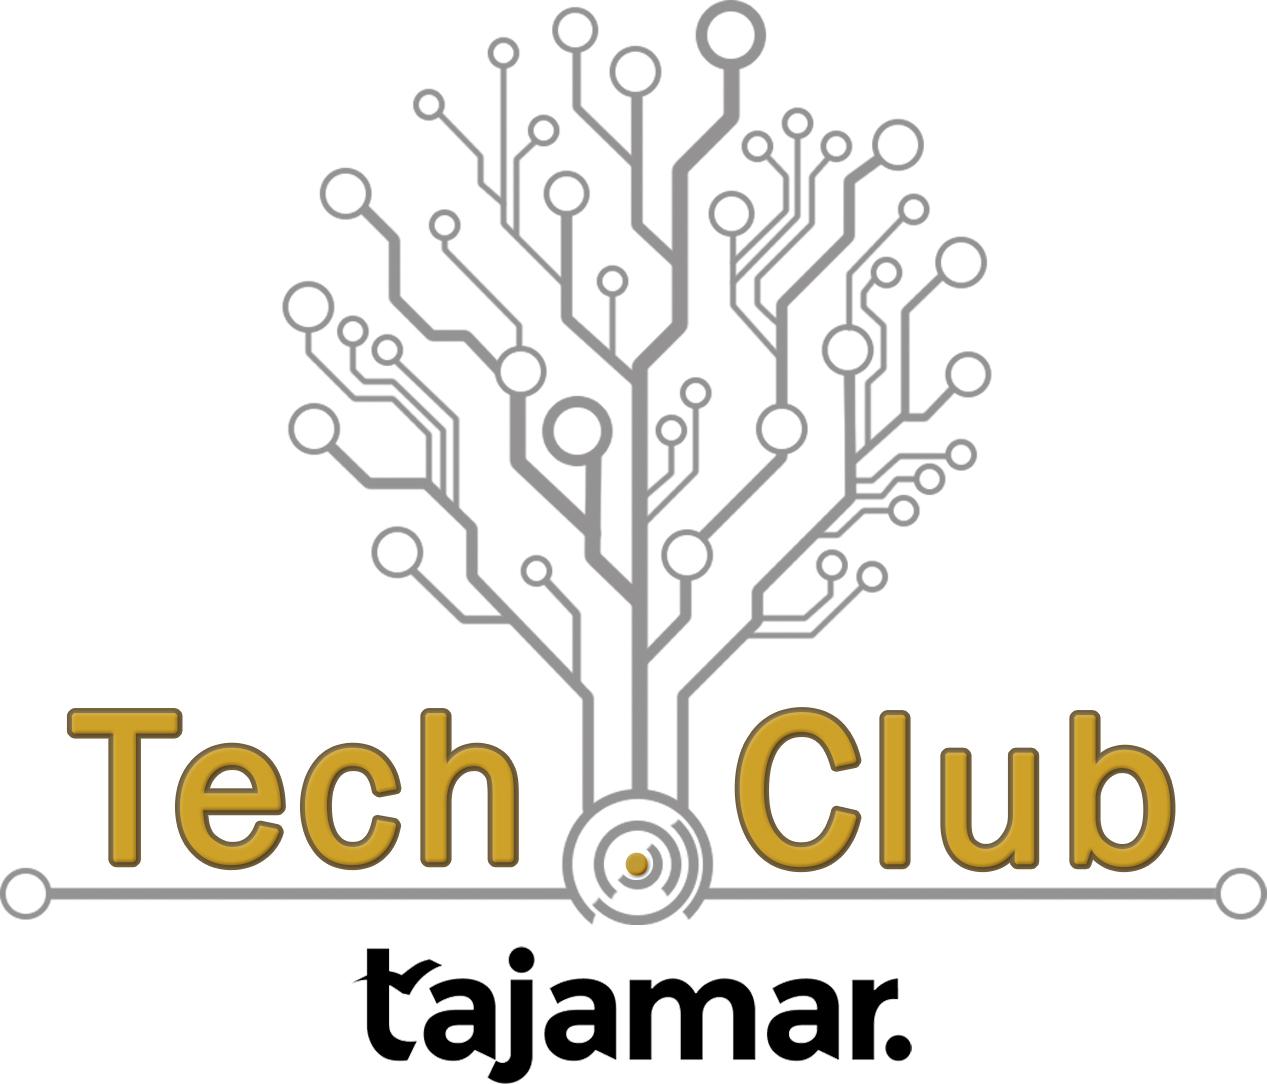 TechClub Tajamar